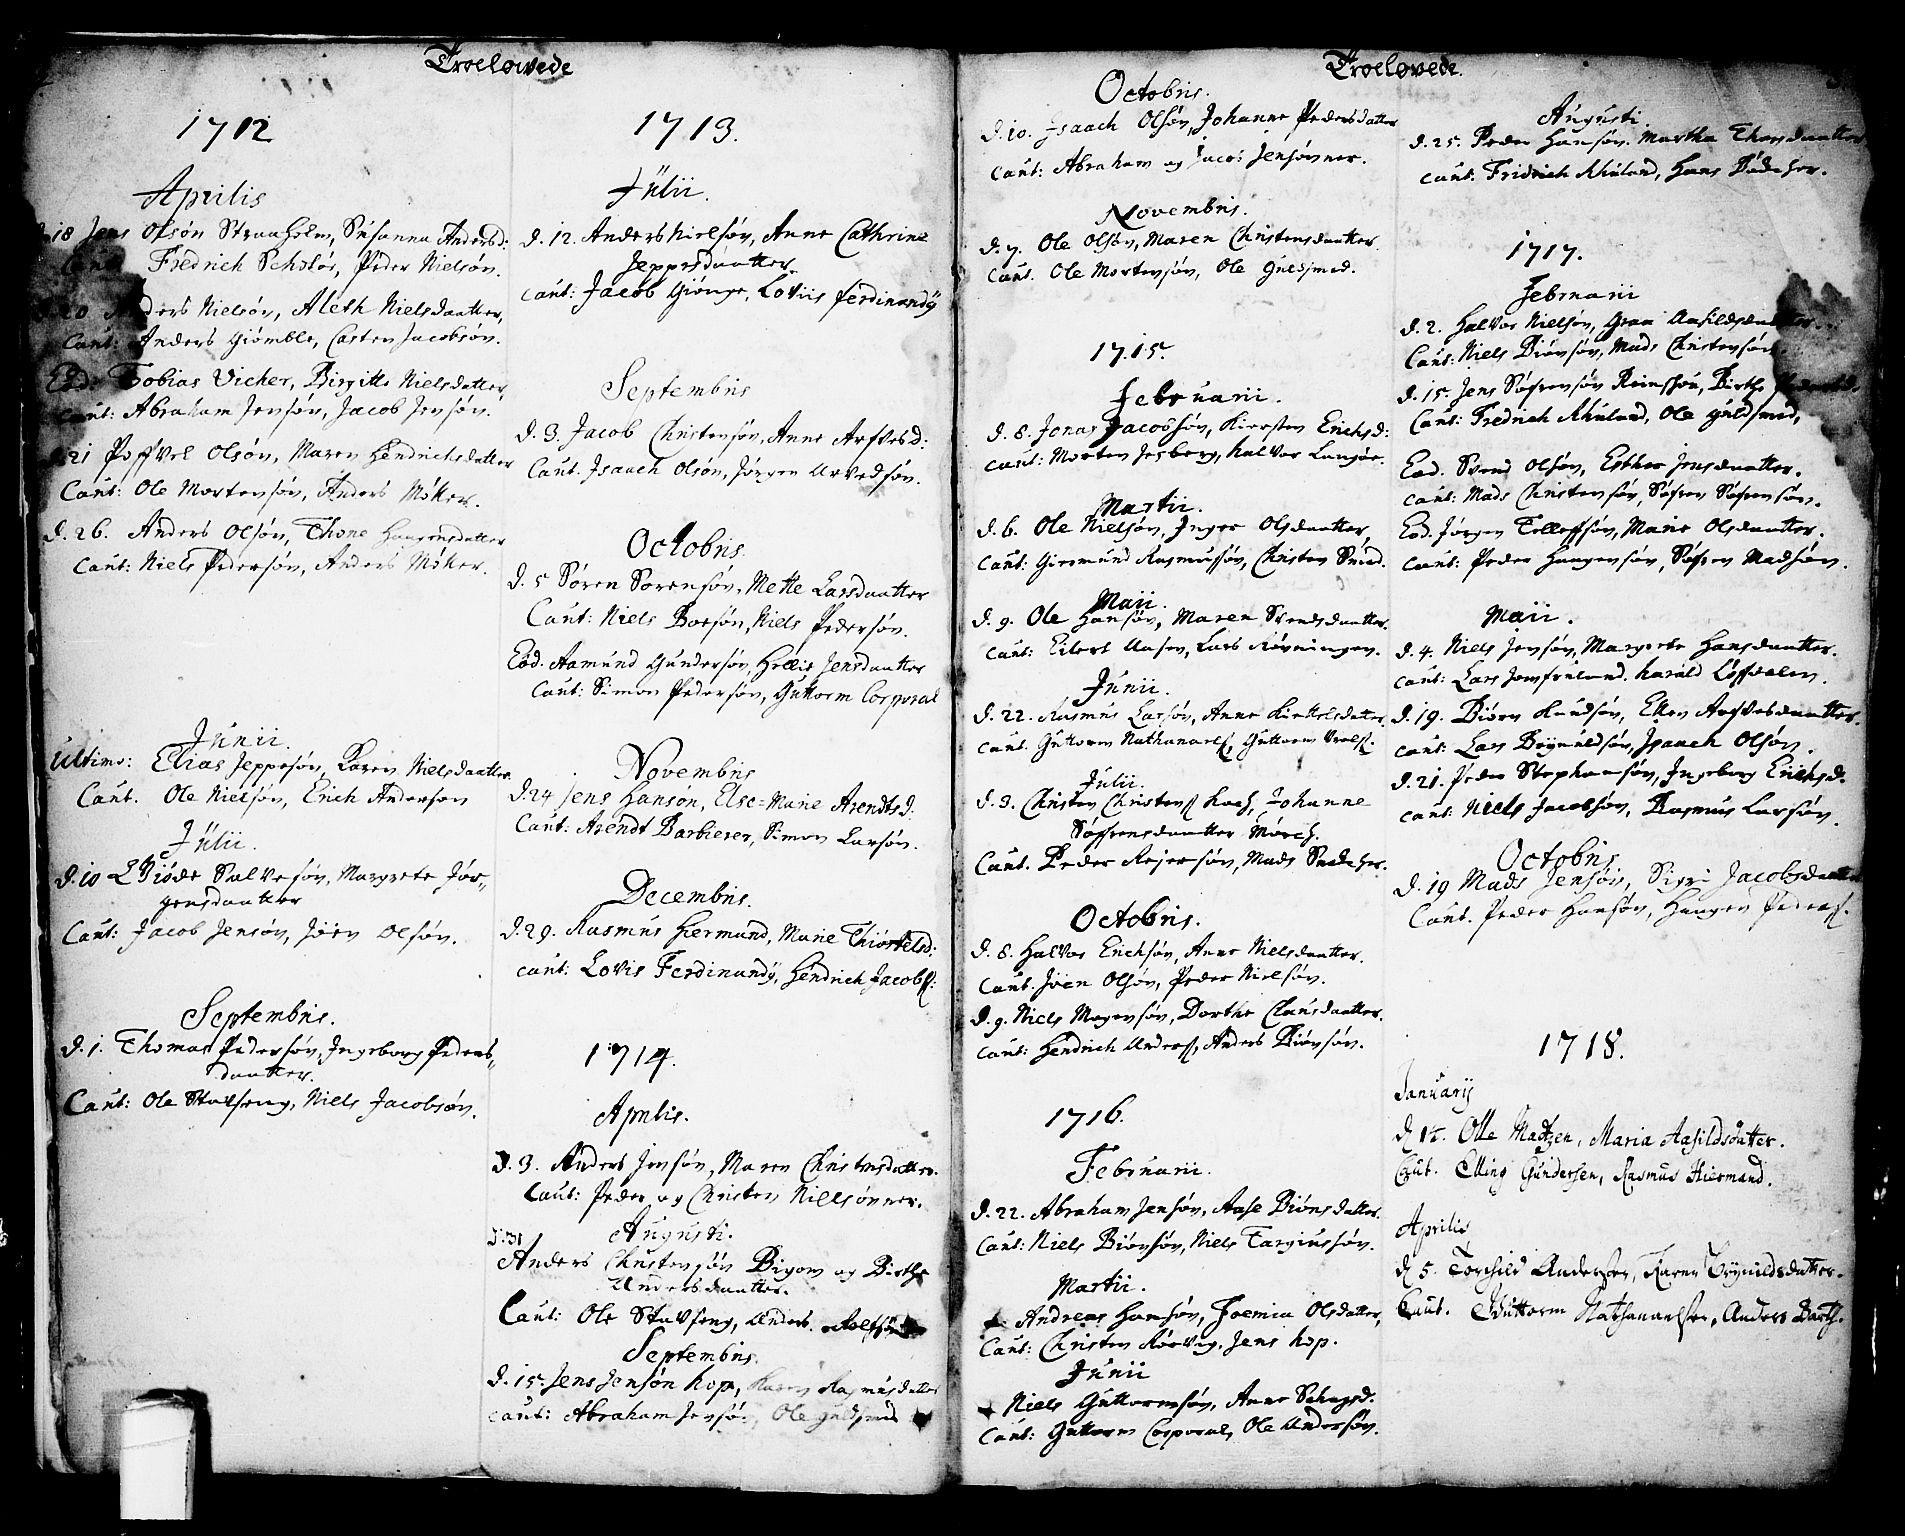 SAKO, Kragerø kirkebøker, F/Fa/L0001: Ministerialbok nr. 1, 1702-1766, s. 4-5